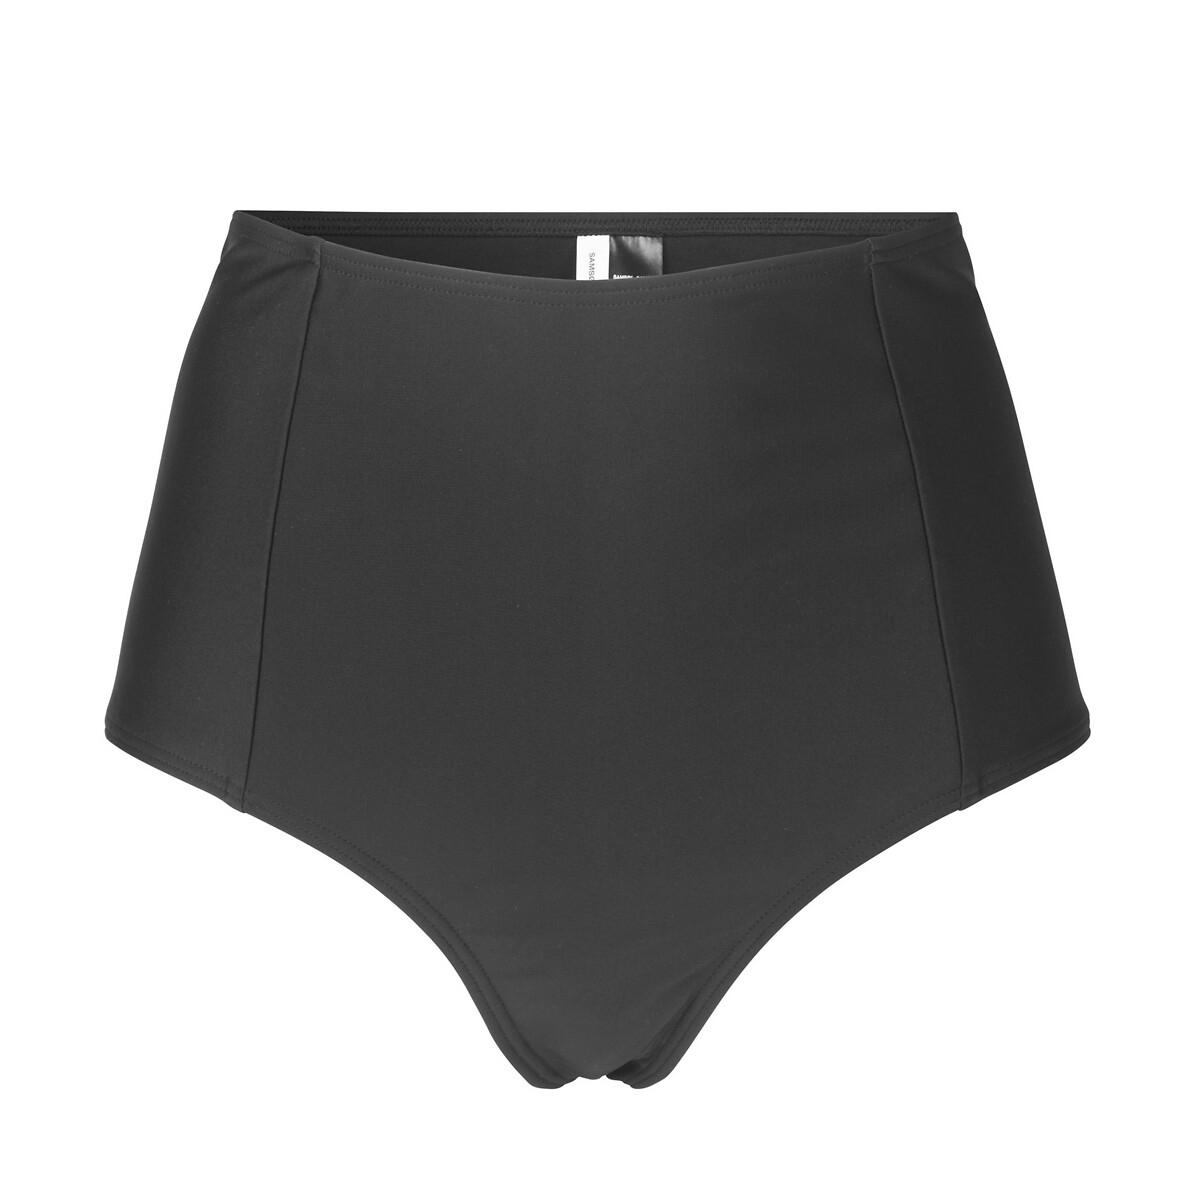 Bas de maillot de bain culotte haute GYTTA BIKINI